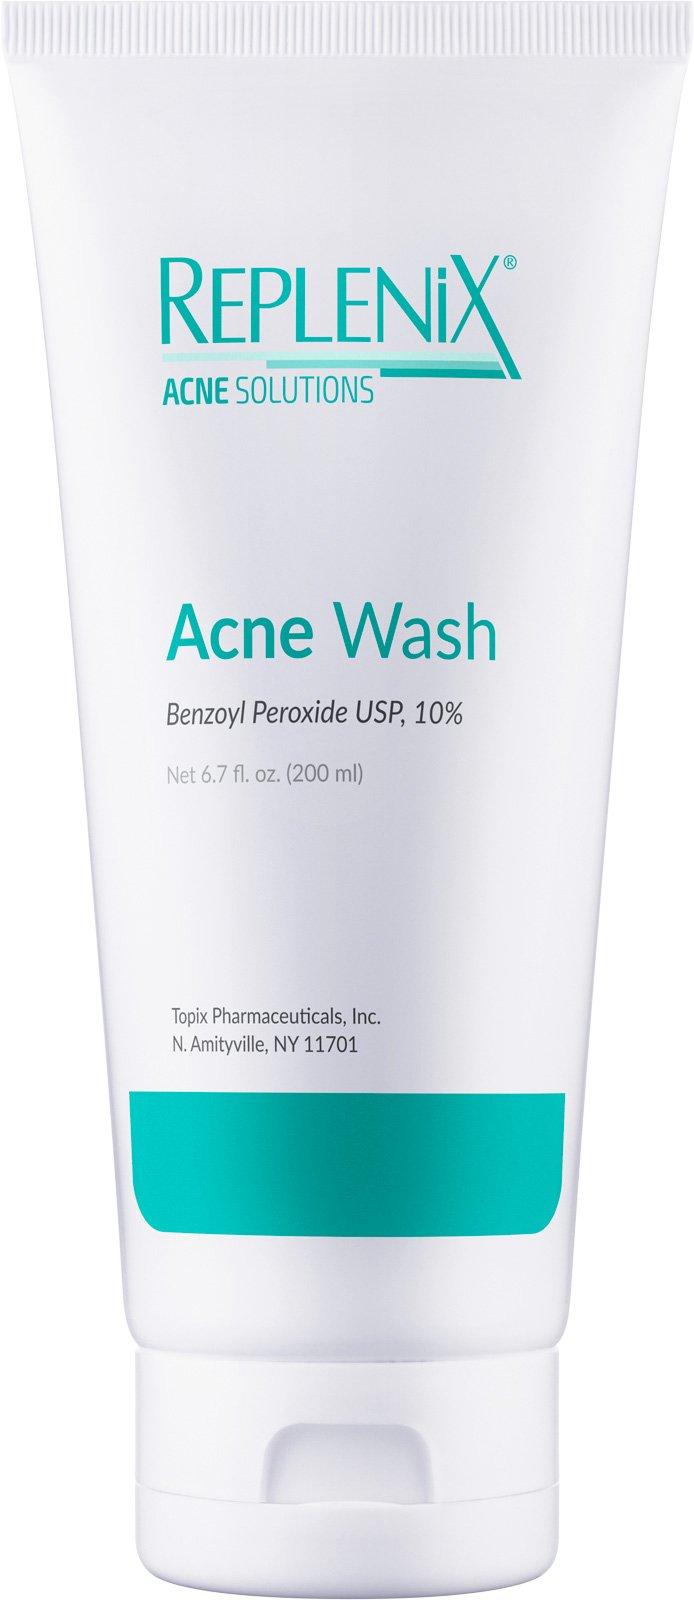 Replenix Benzoyl Peroxide Wash